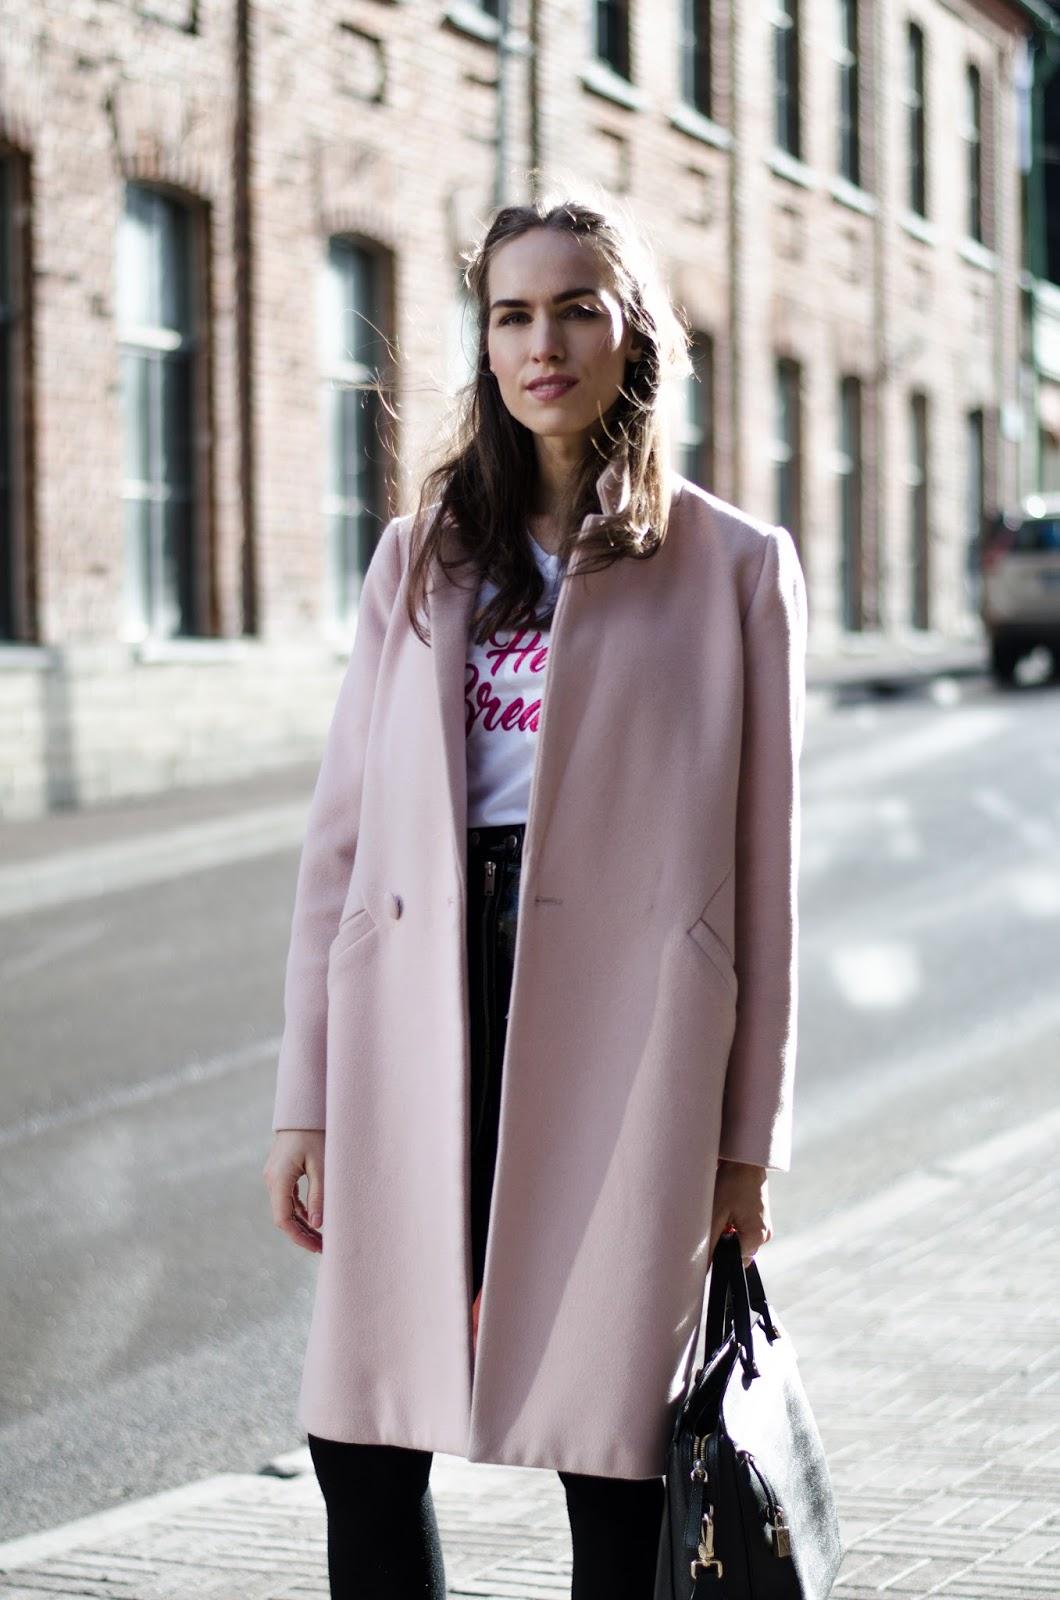 kristjaana mere pink coat minimalist spring outfit